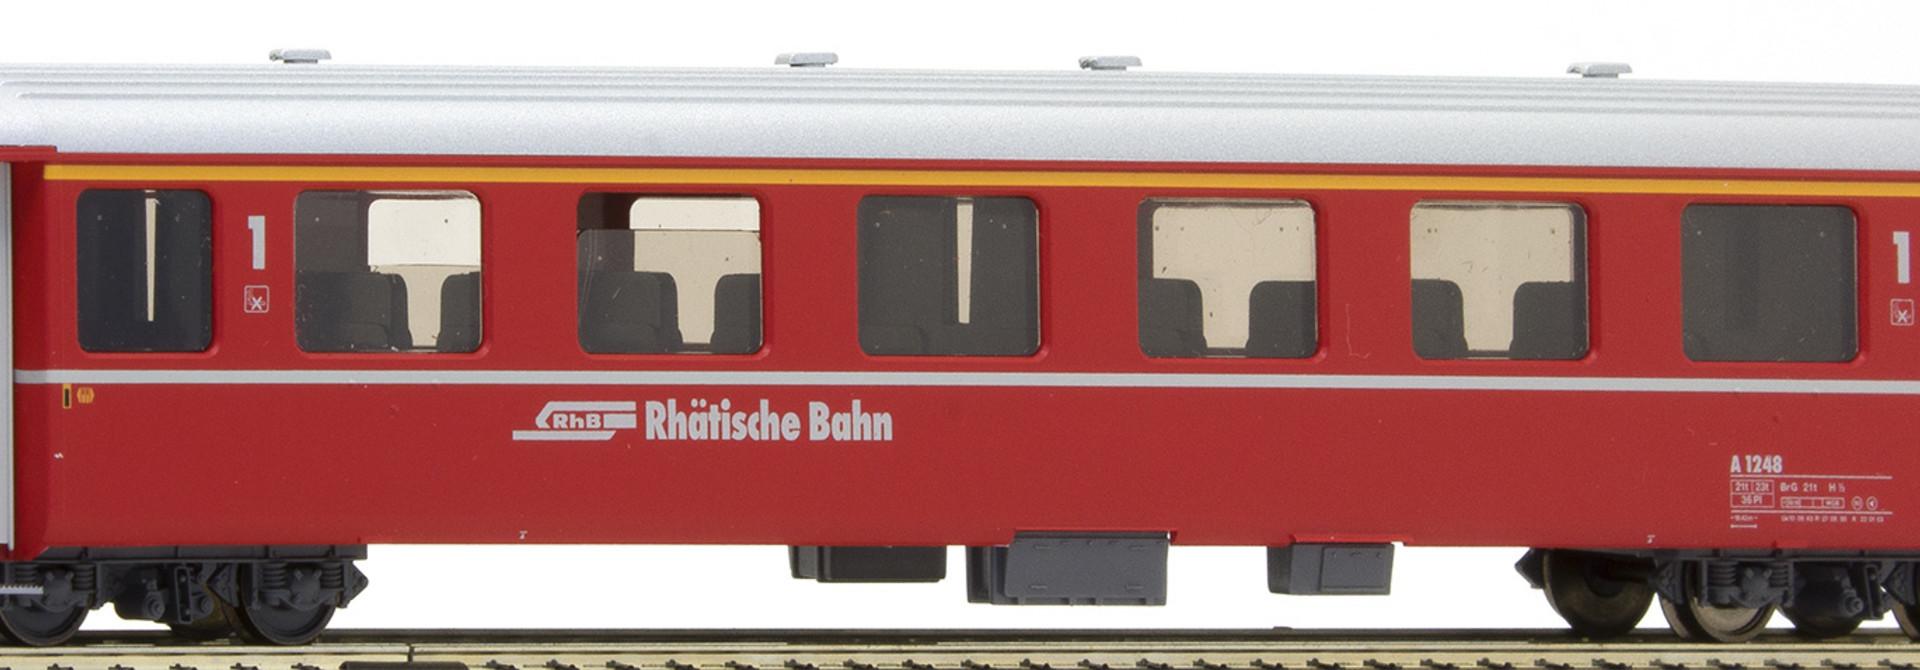 3252158 RhB A 1248 Einheitswagen I